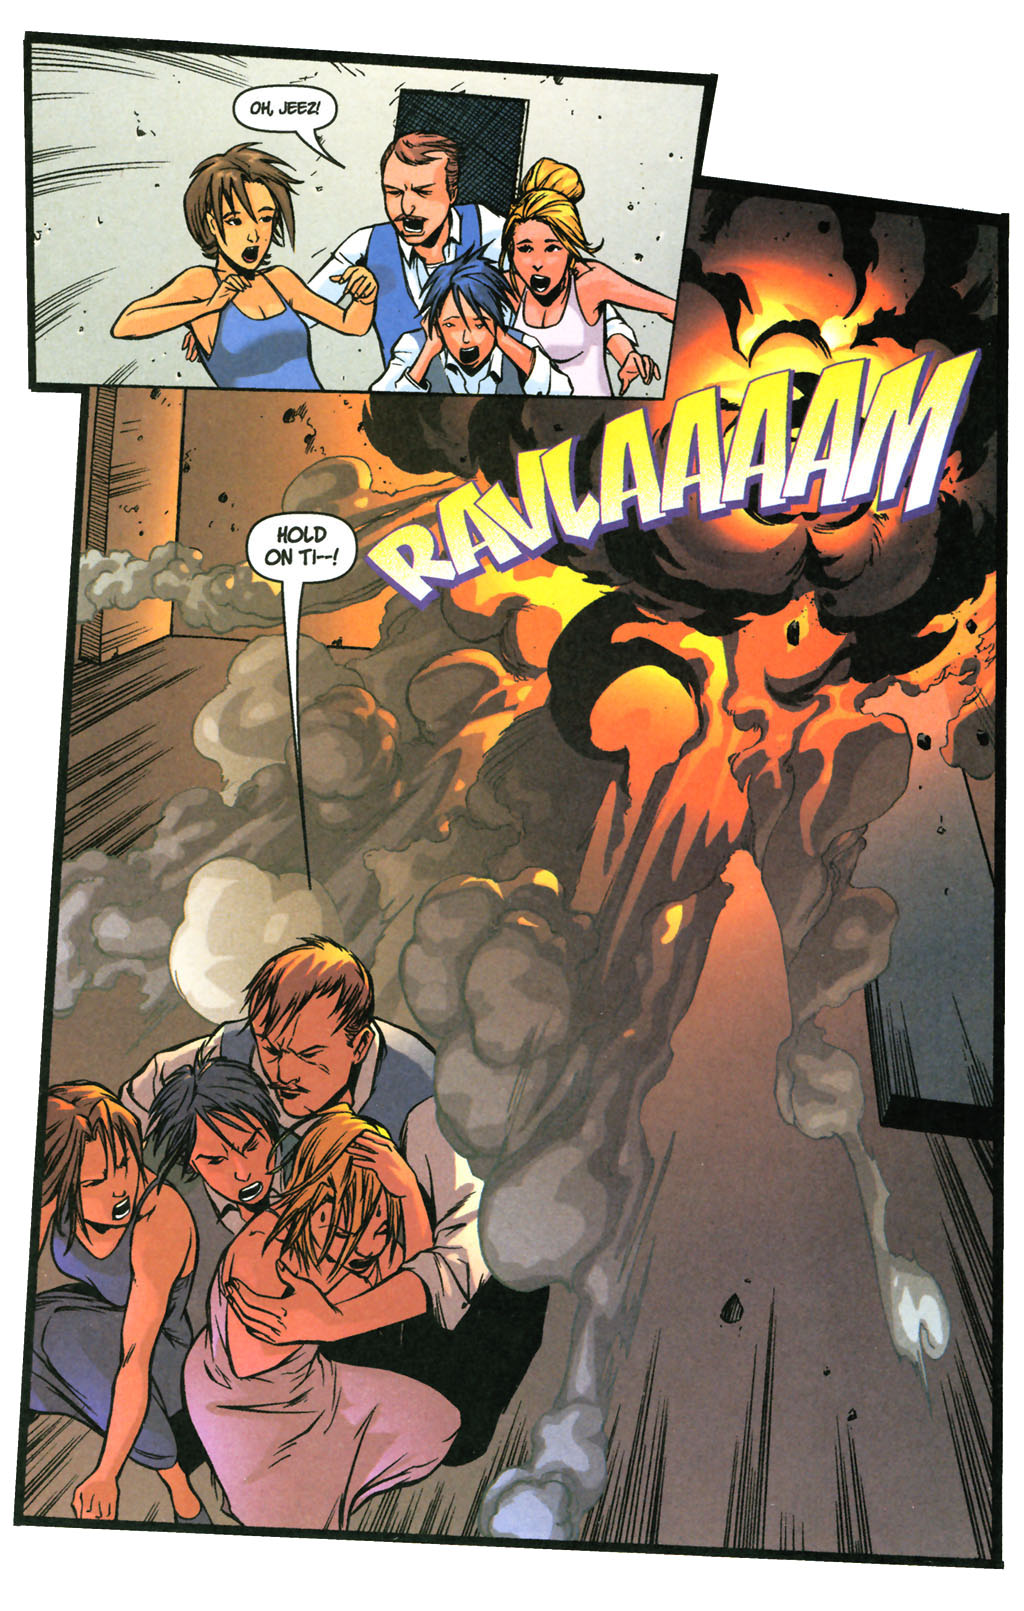 Read online SpyBoy: Final Exam comic -  Issue #3 - 22